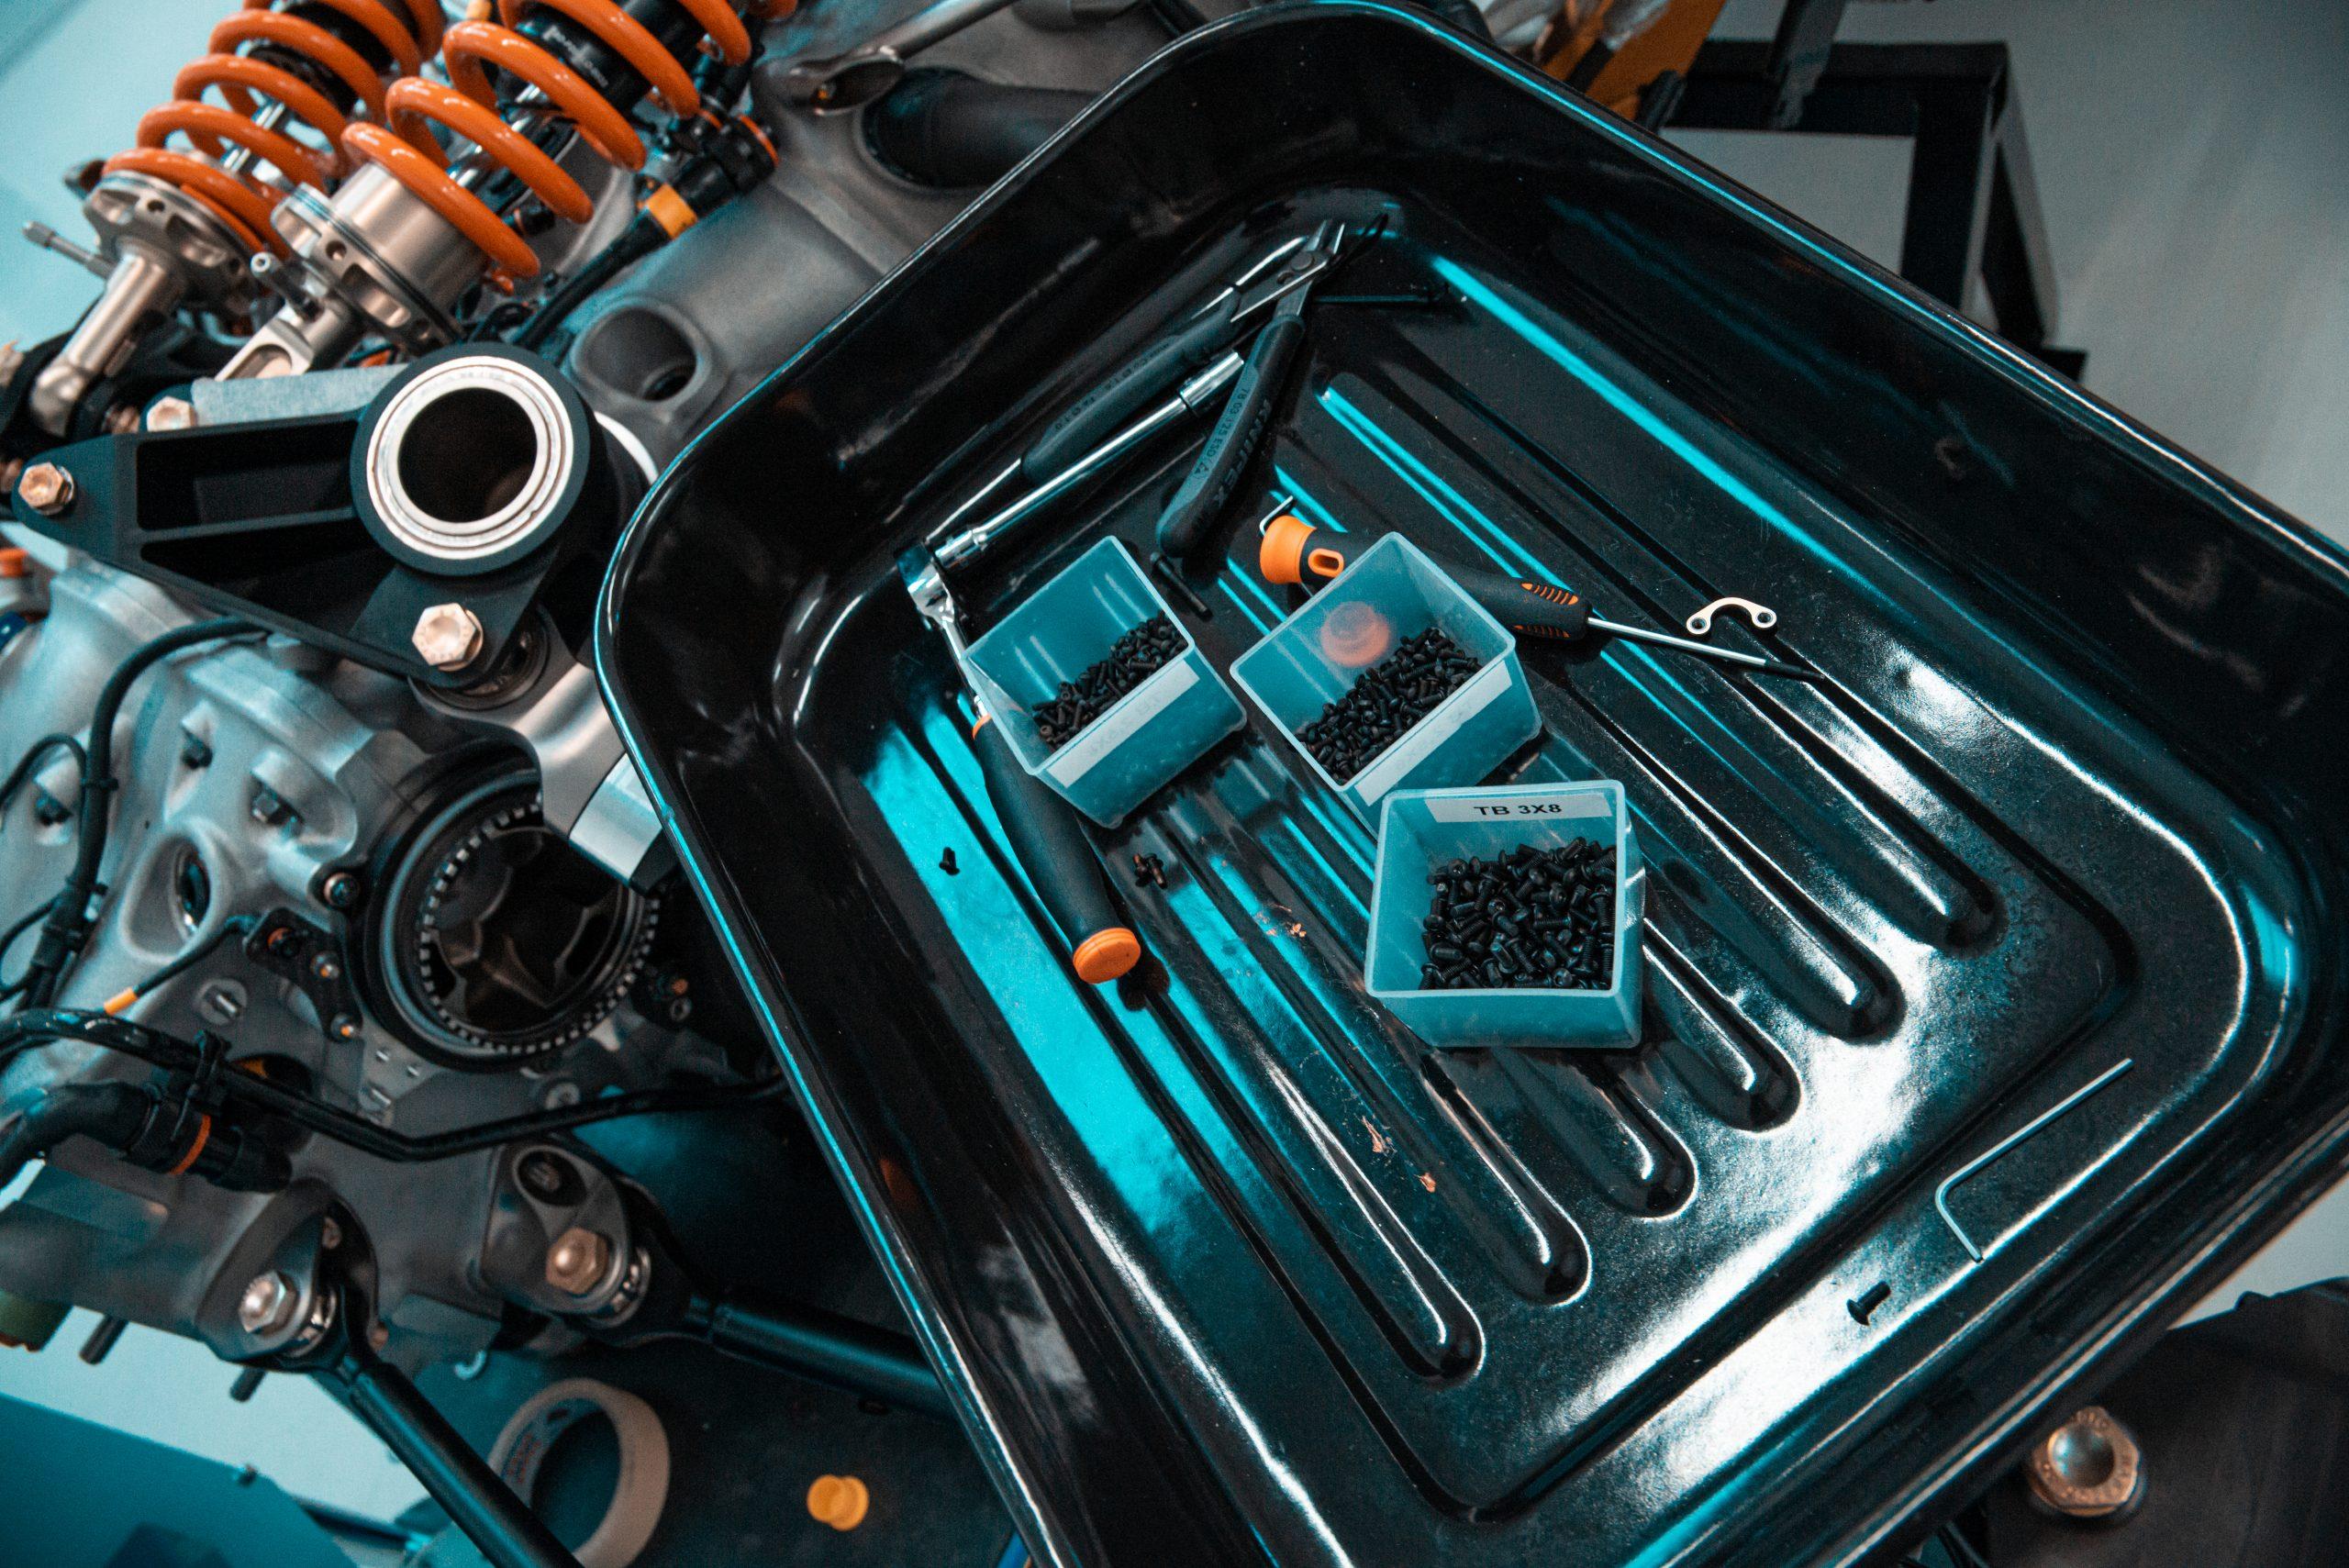 Glickenhaus 007 Hypercar LMH tools engine race shop